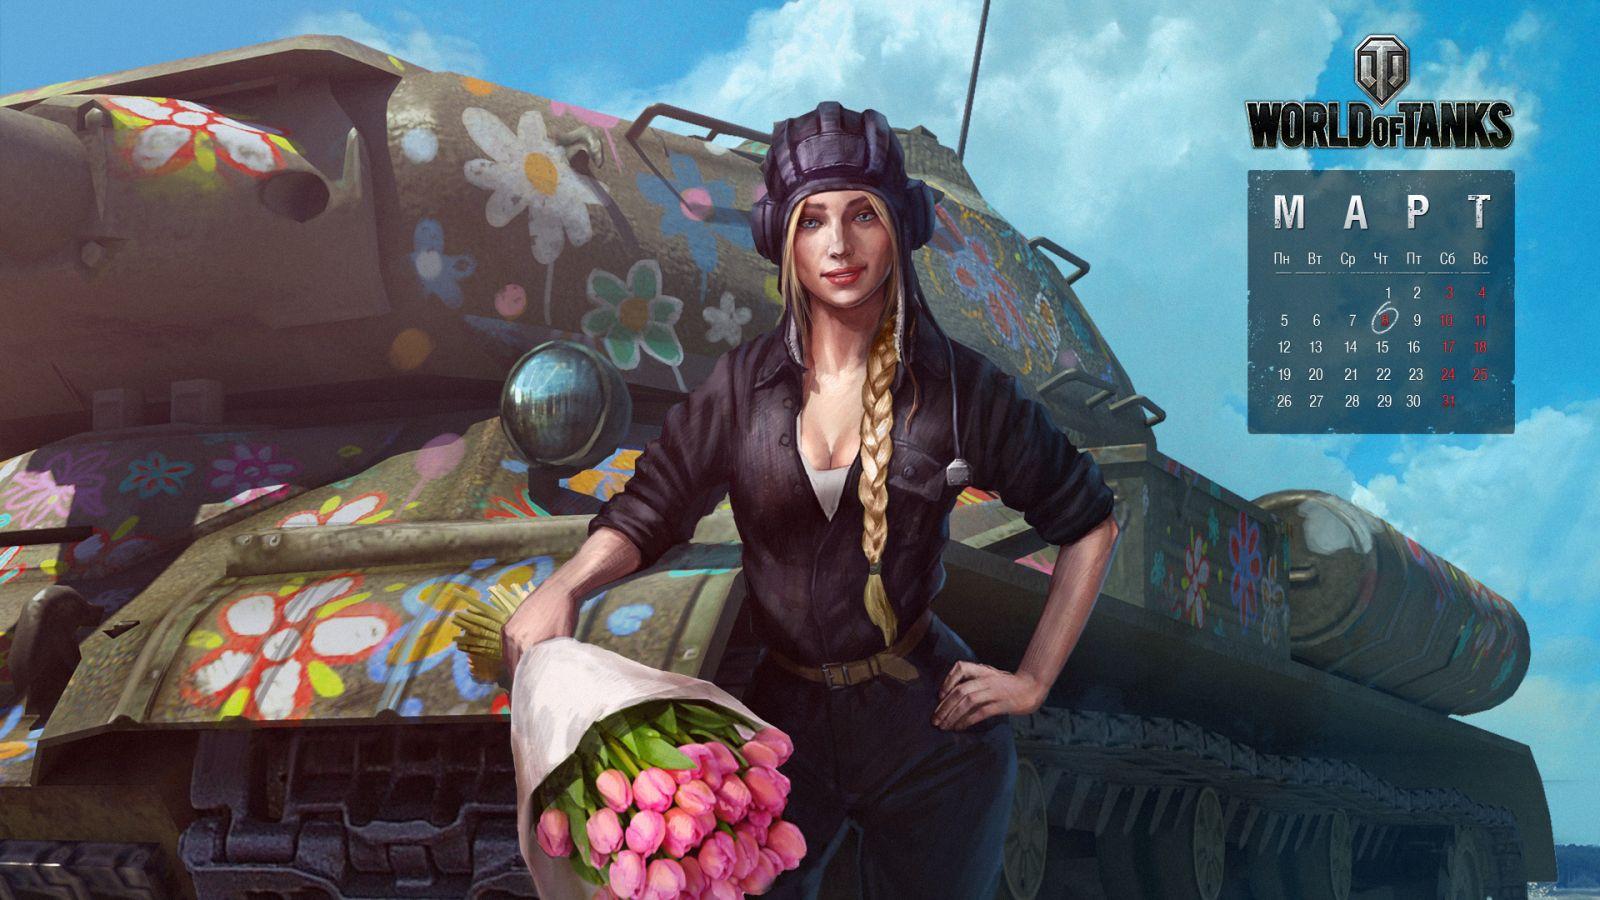 бонус код для world of tanks 2014 на март